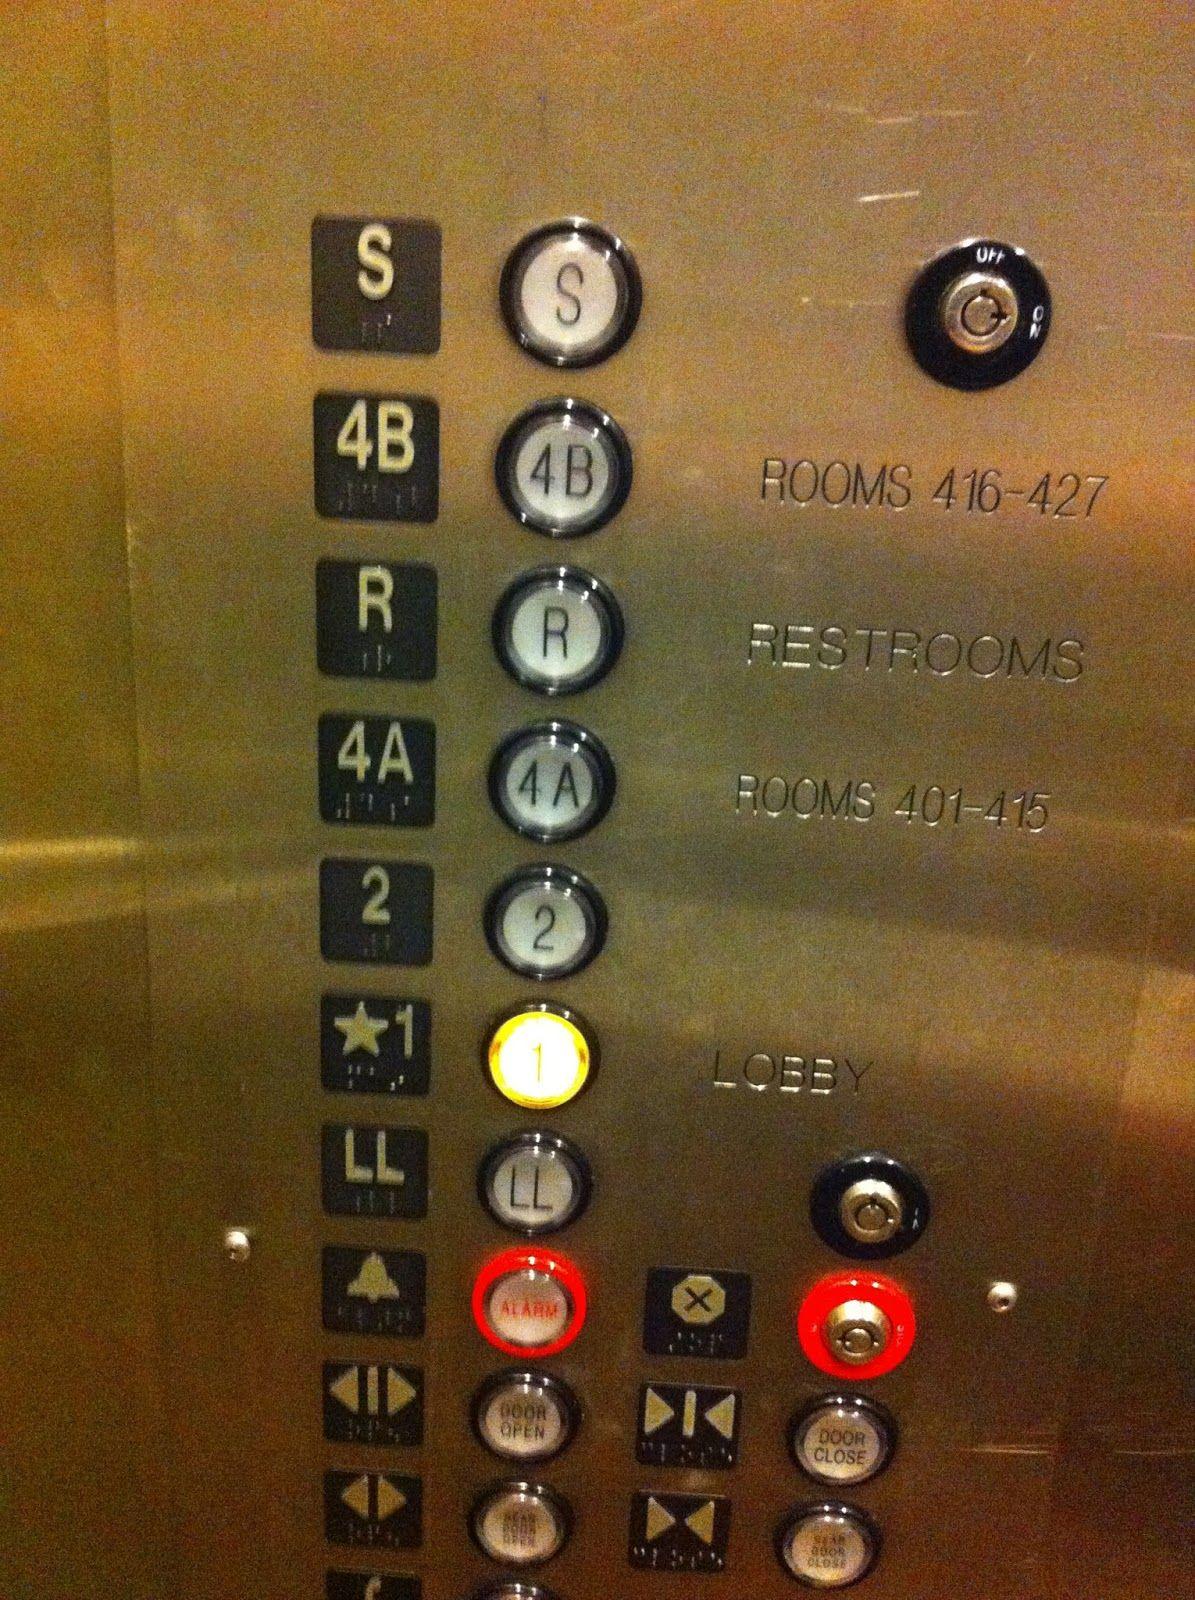 human factors in elevator control interface design google search